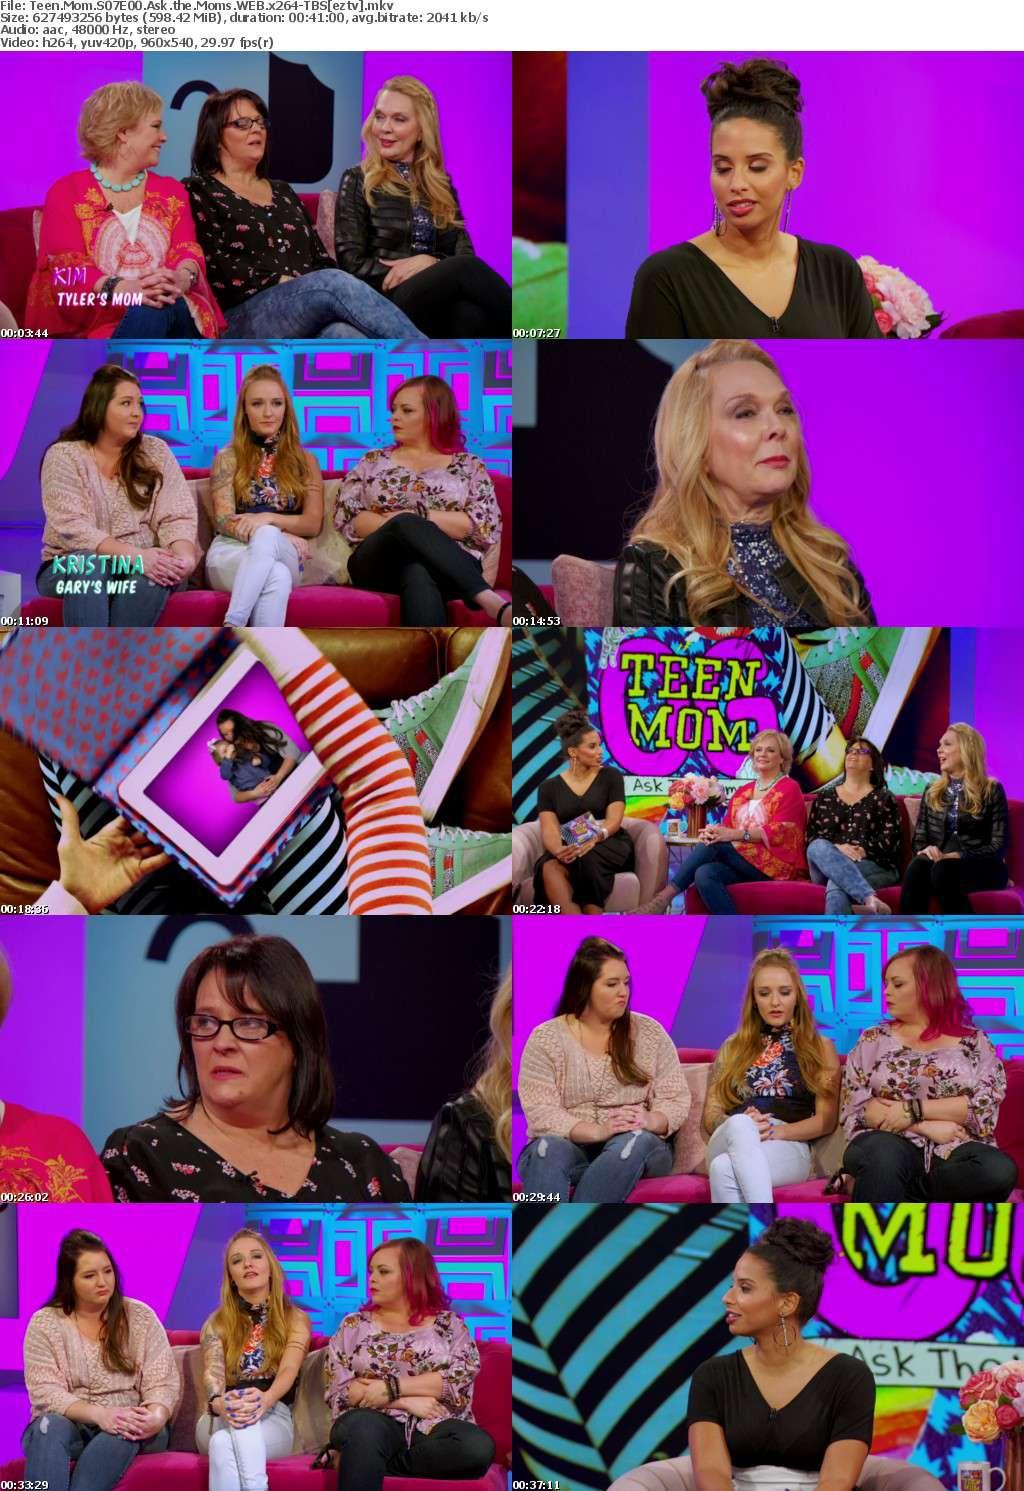 Teen Mom S07E00 Ask the Moms WEB x264-TBS